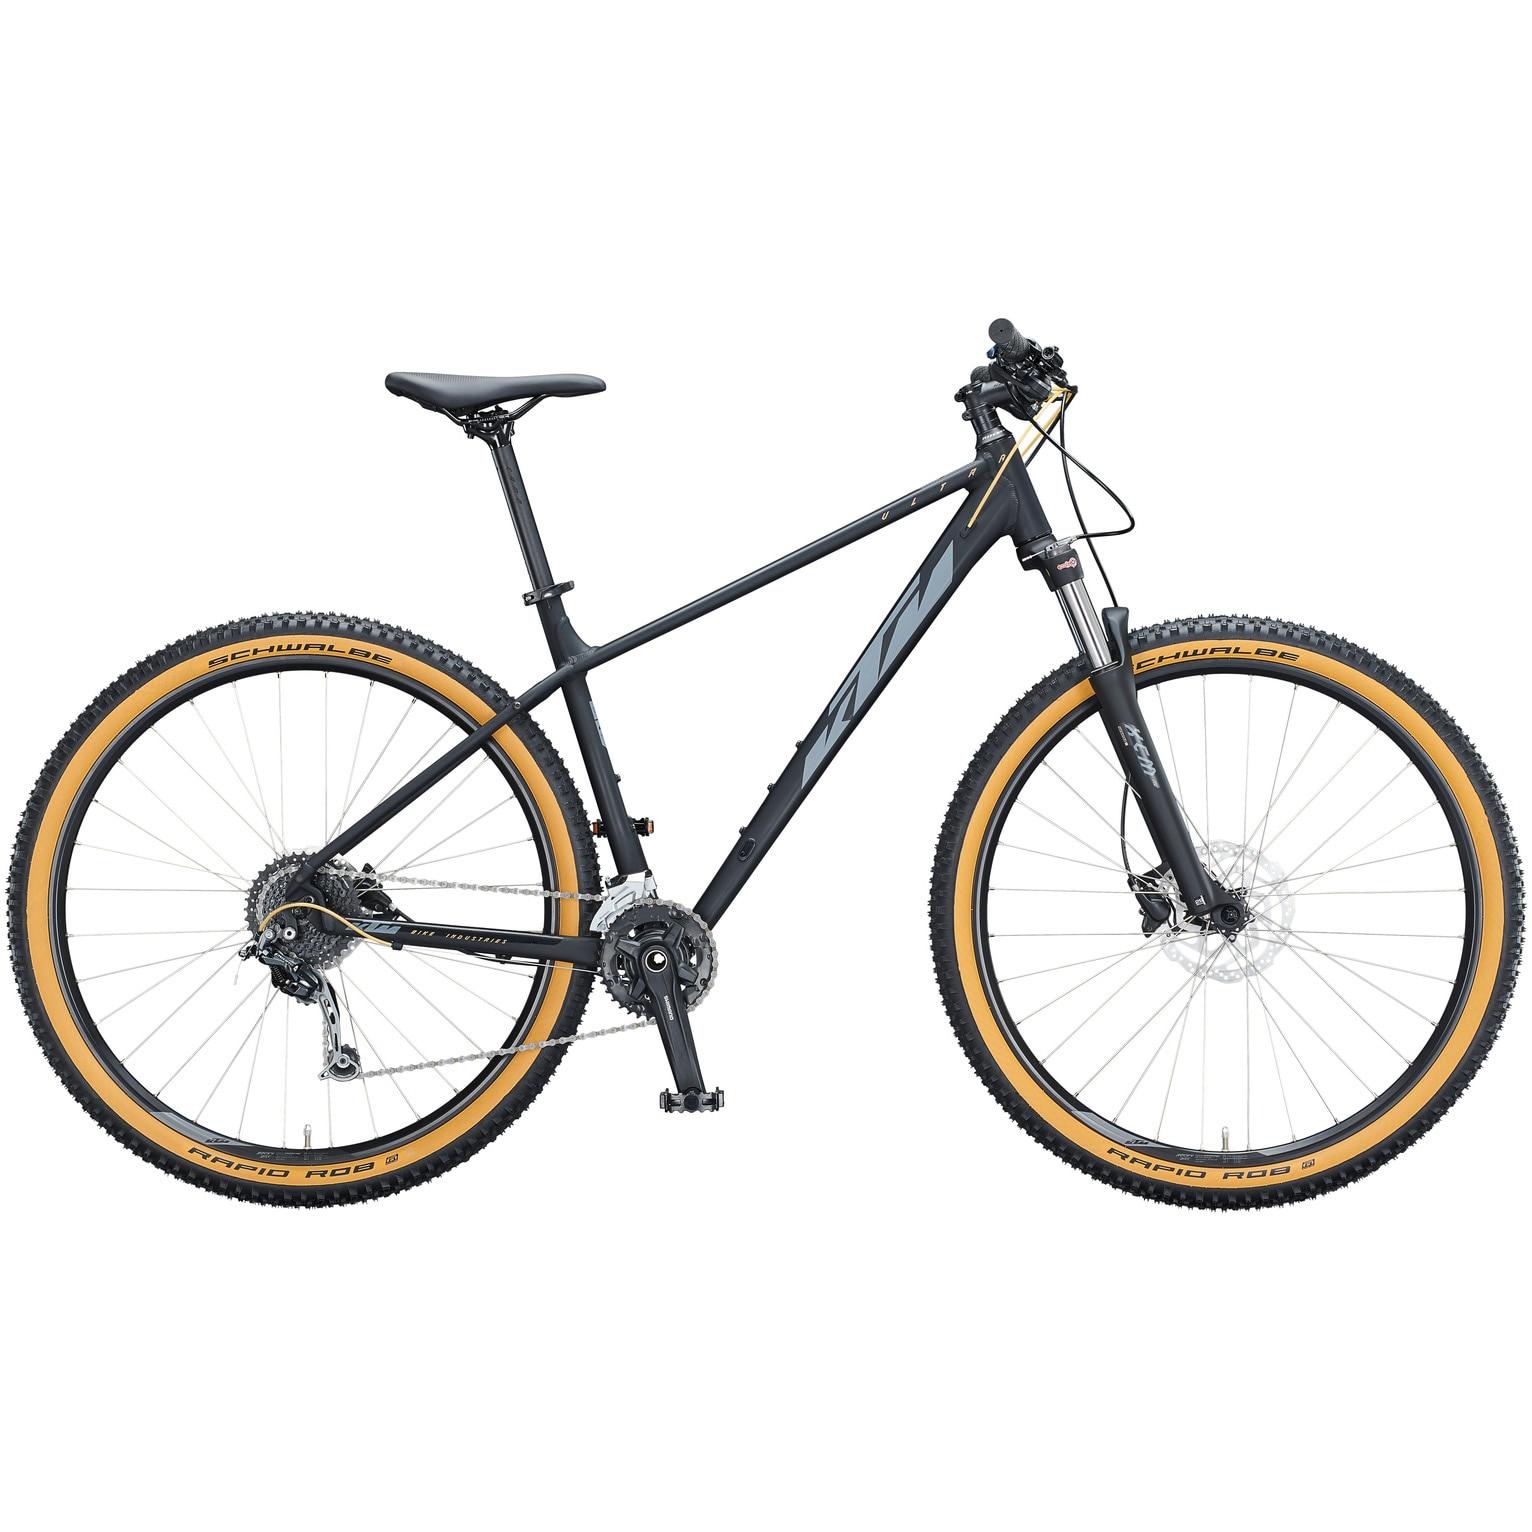 Fotografie Bicicleta KTM Ultra Fun 29-er, Black Matt/Grey Gold, XL, 53cm